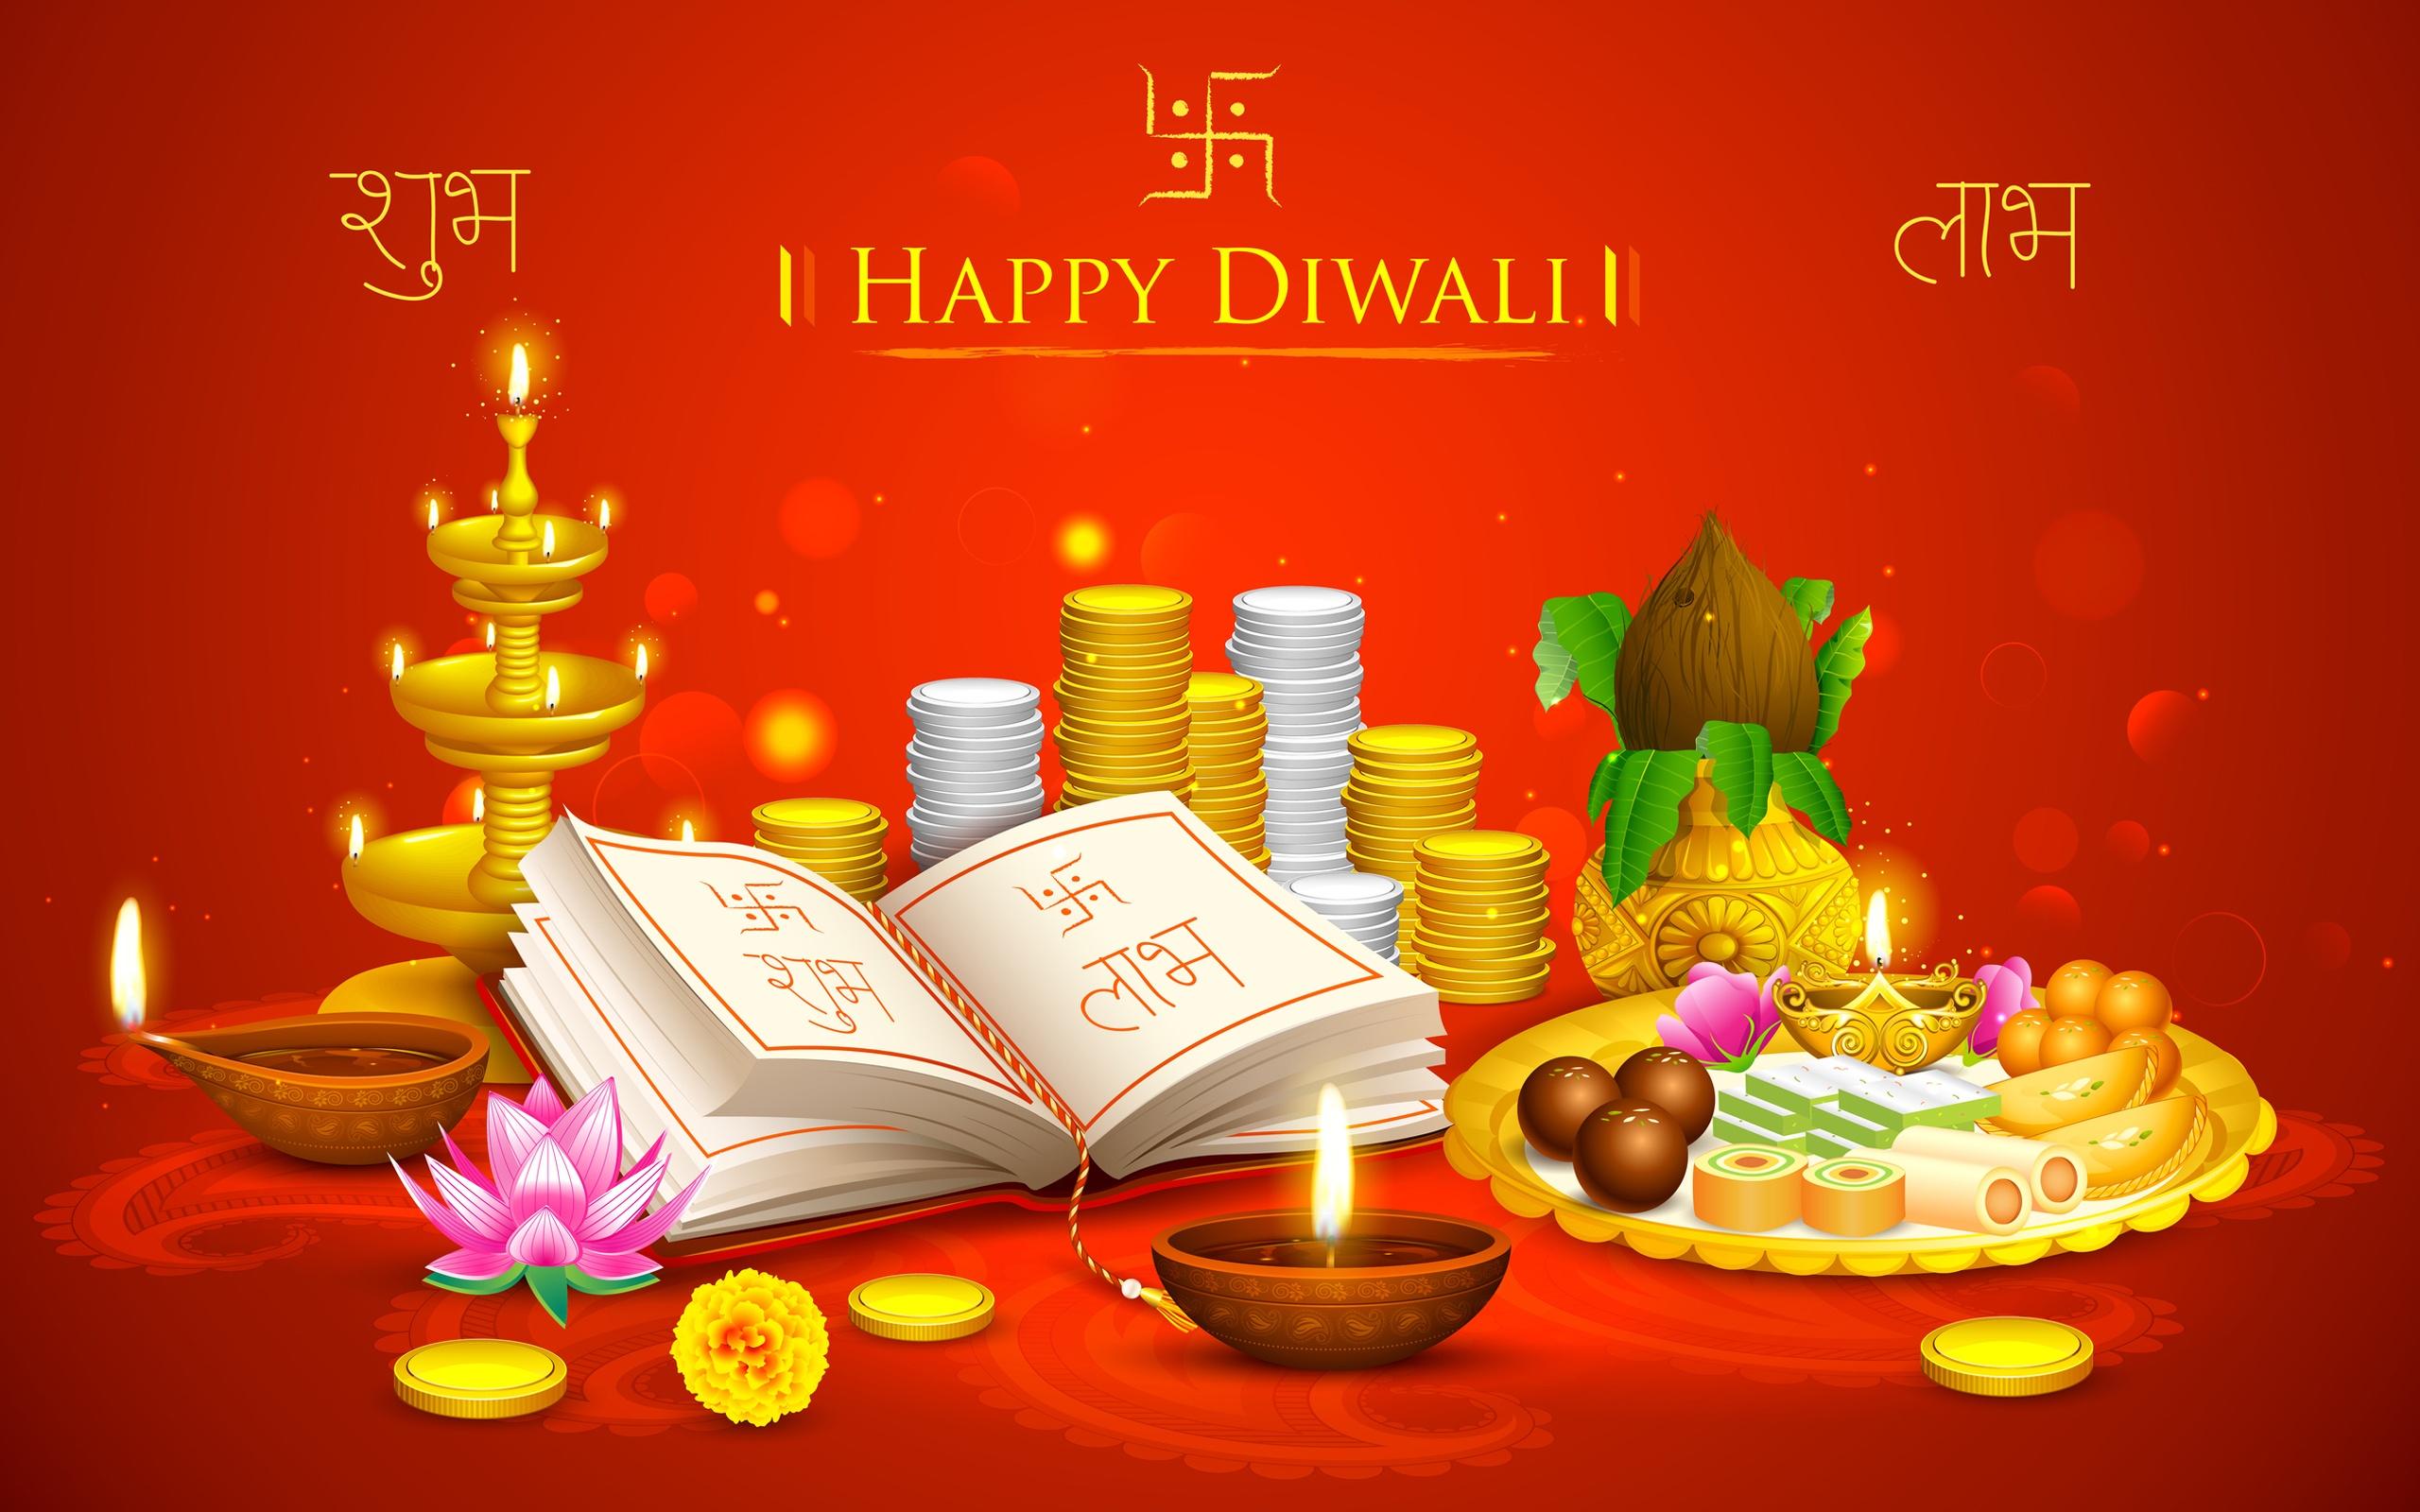 Happy Diwali 2017 HD wallpaper